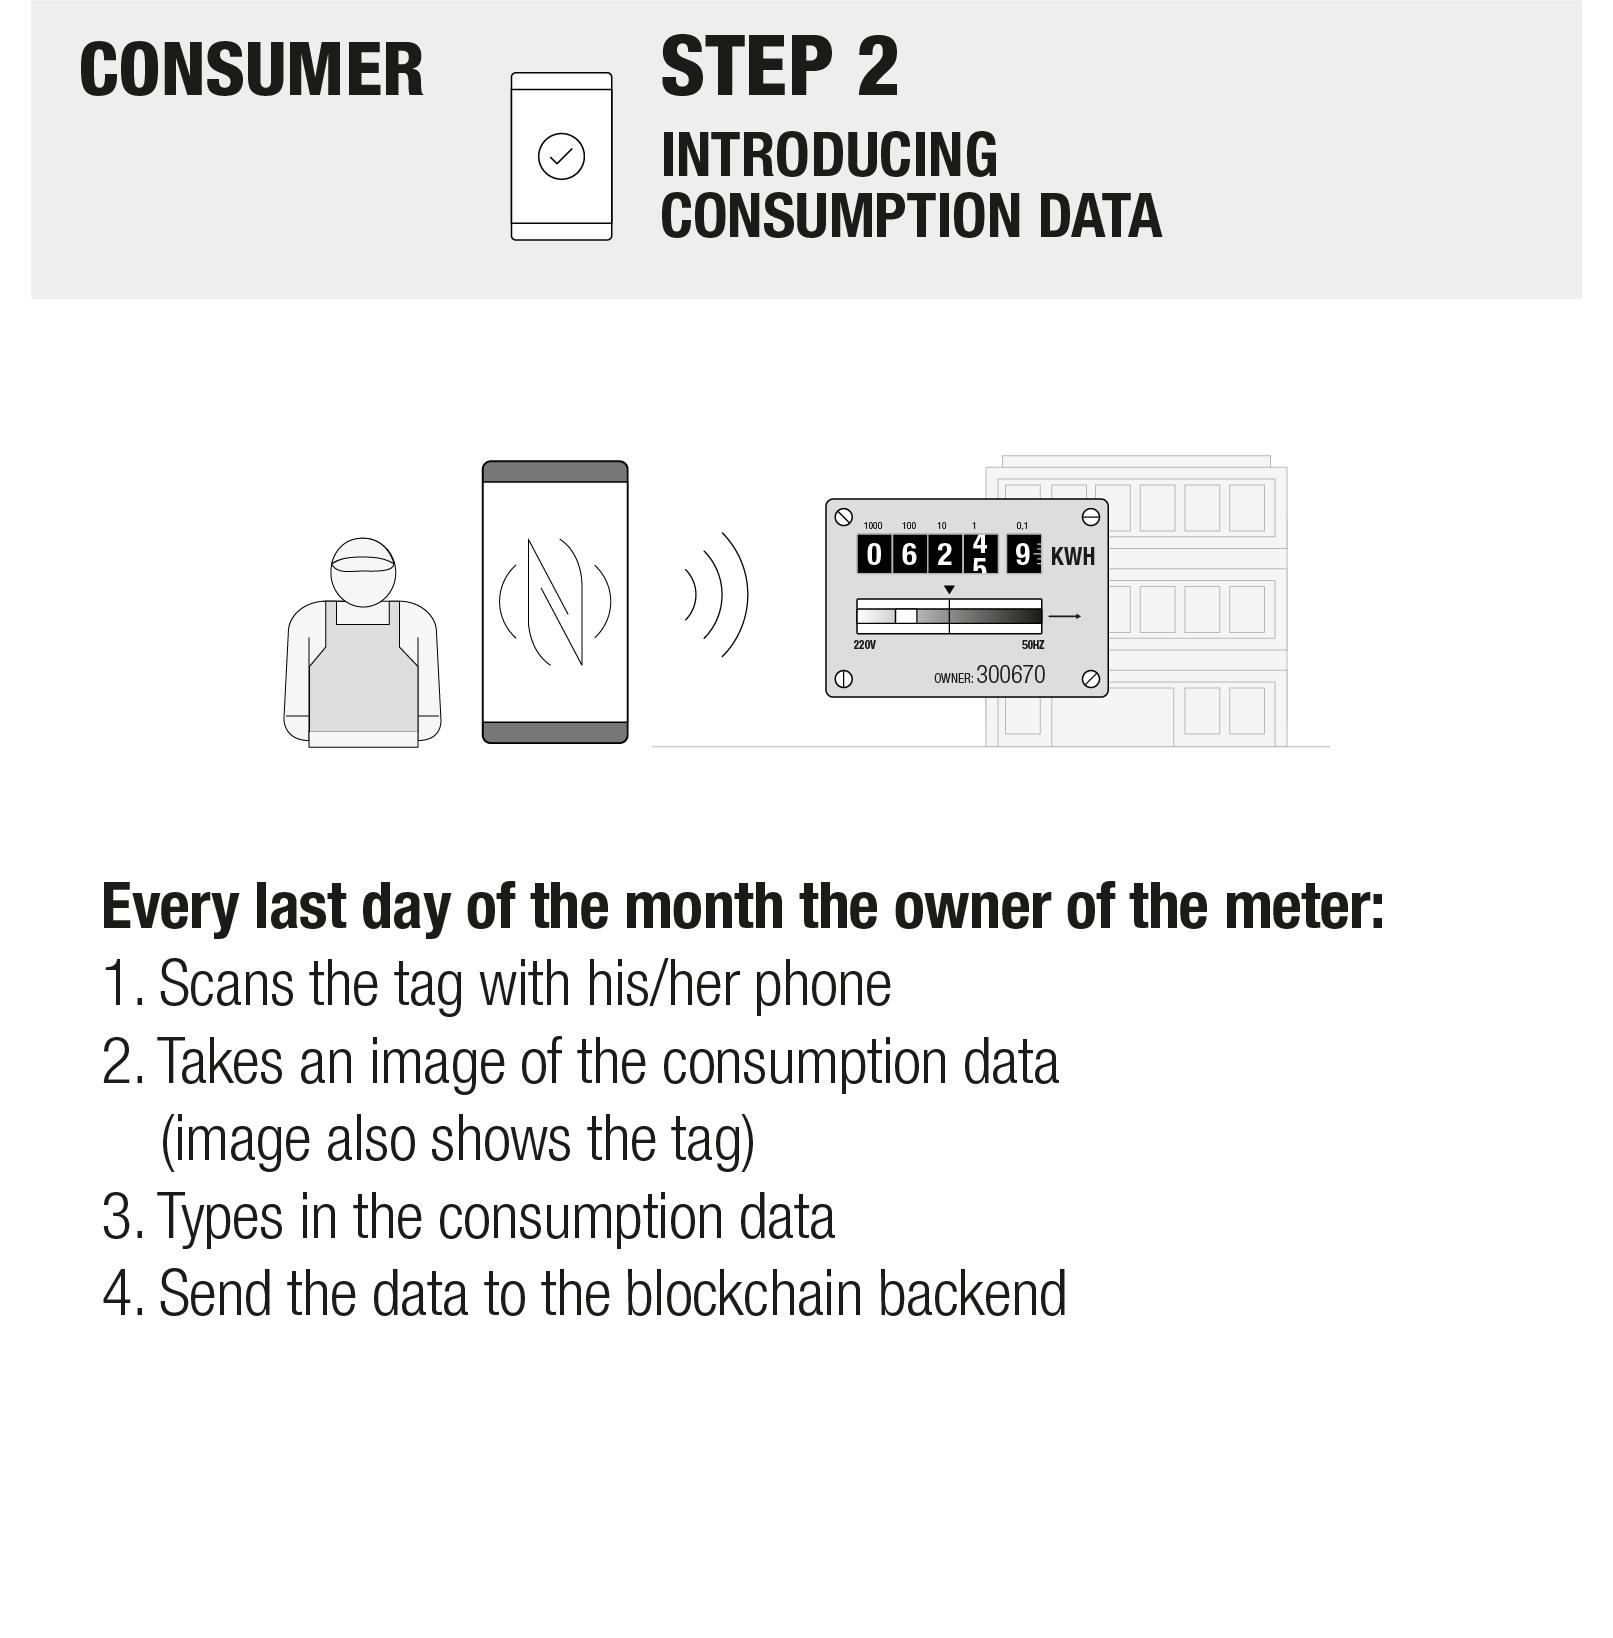 Consumer_Introducing_Consumption_Data.png